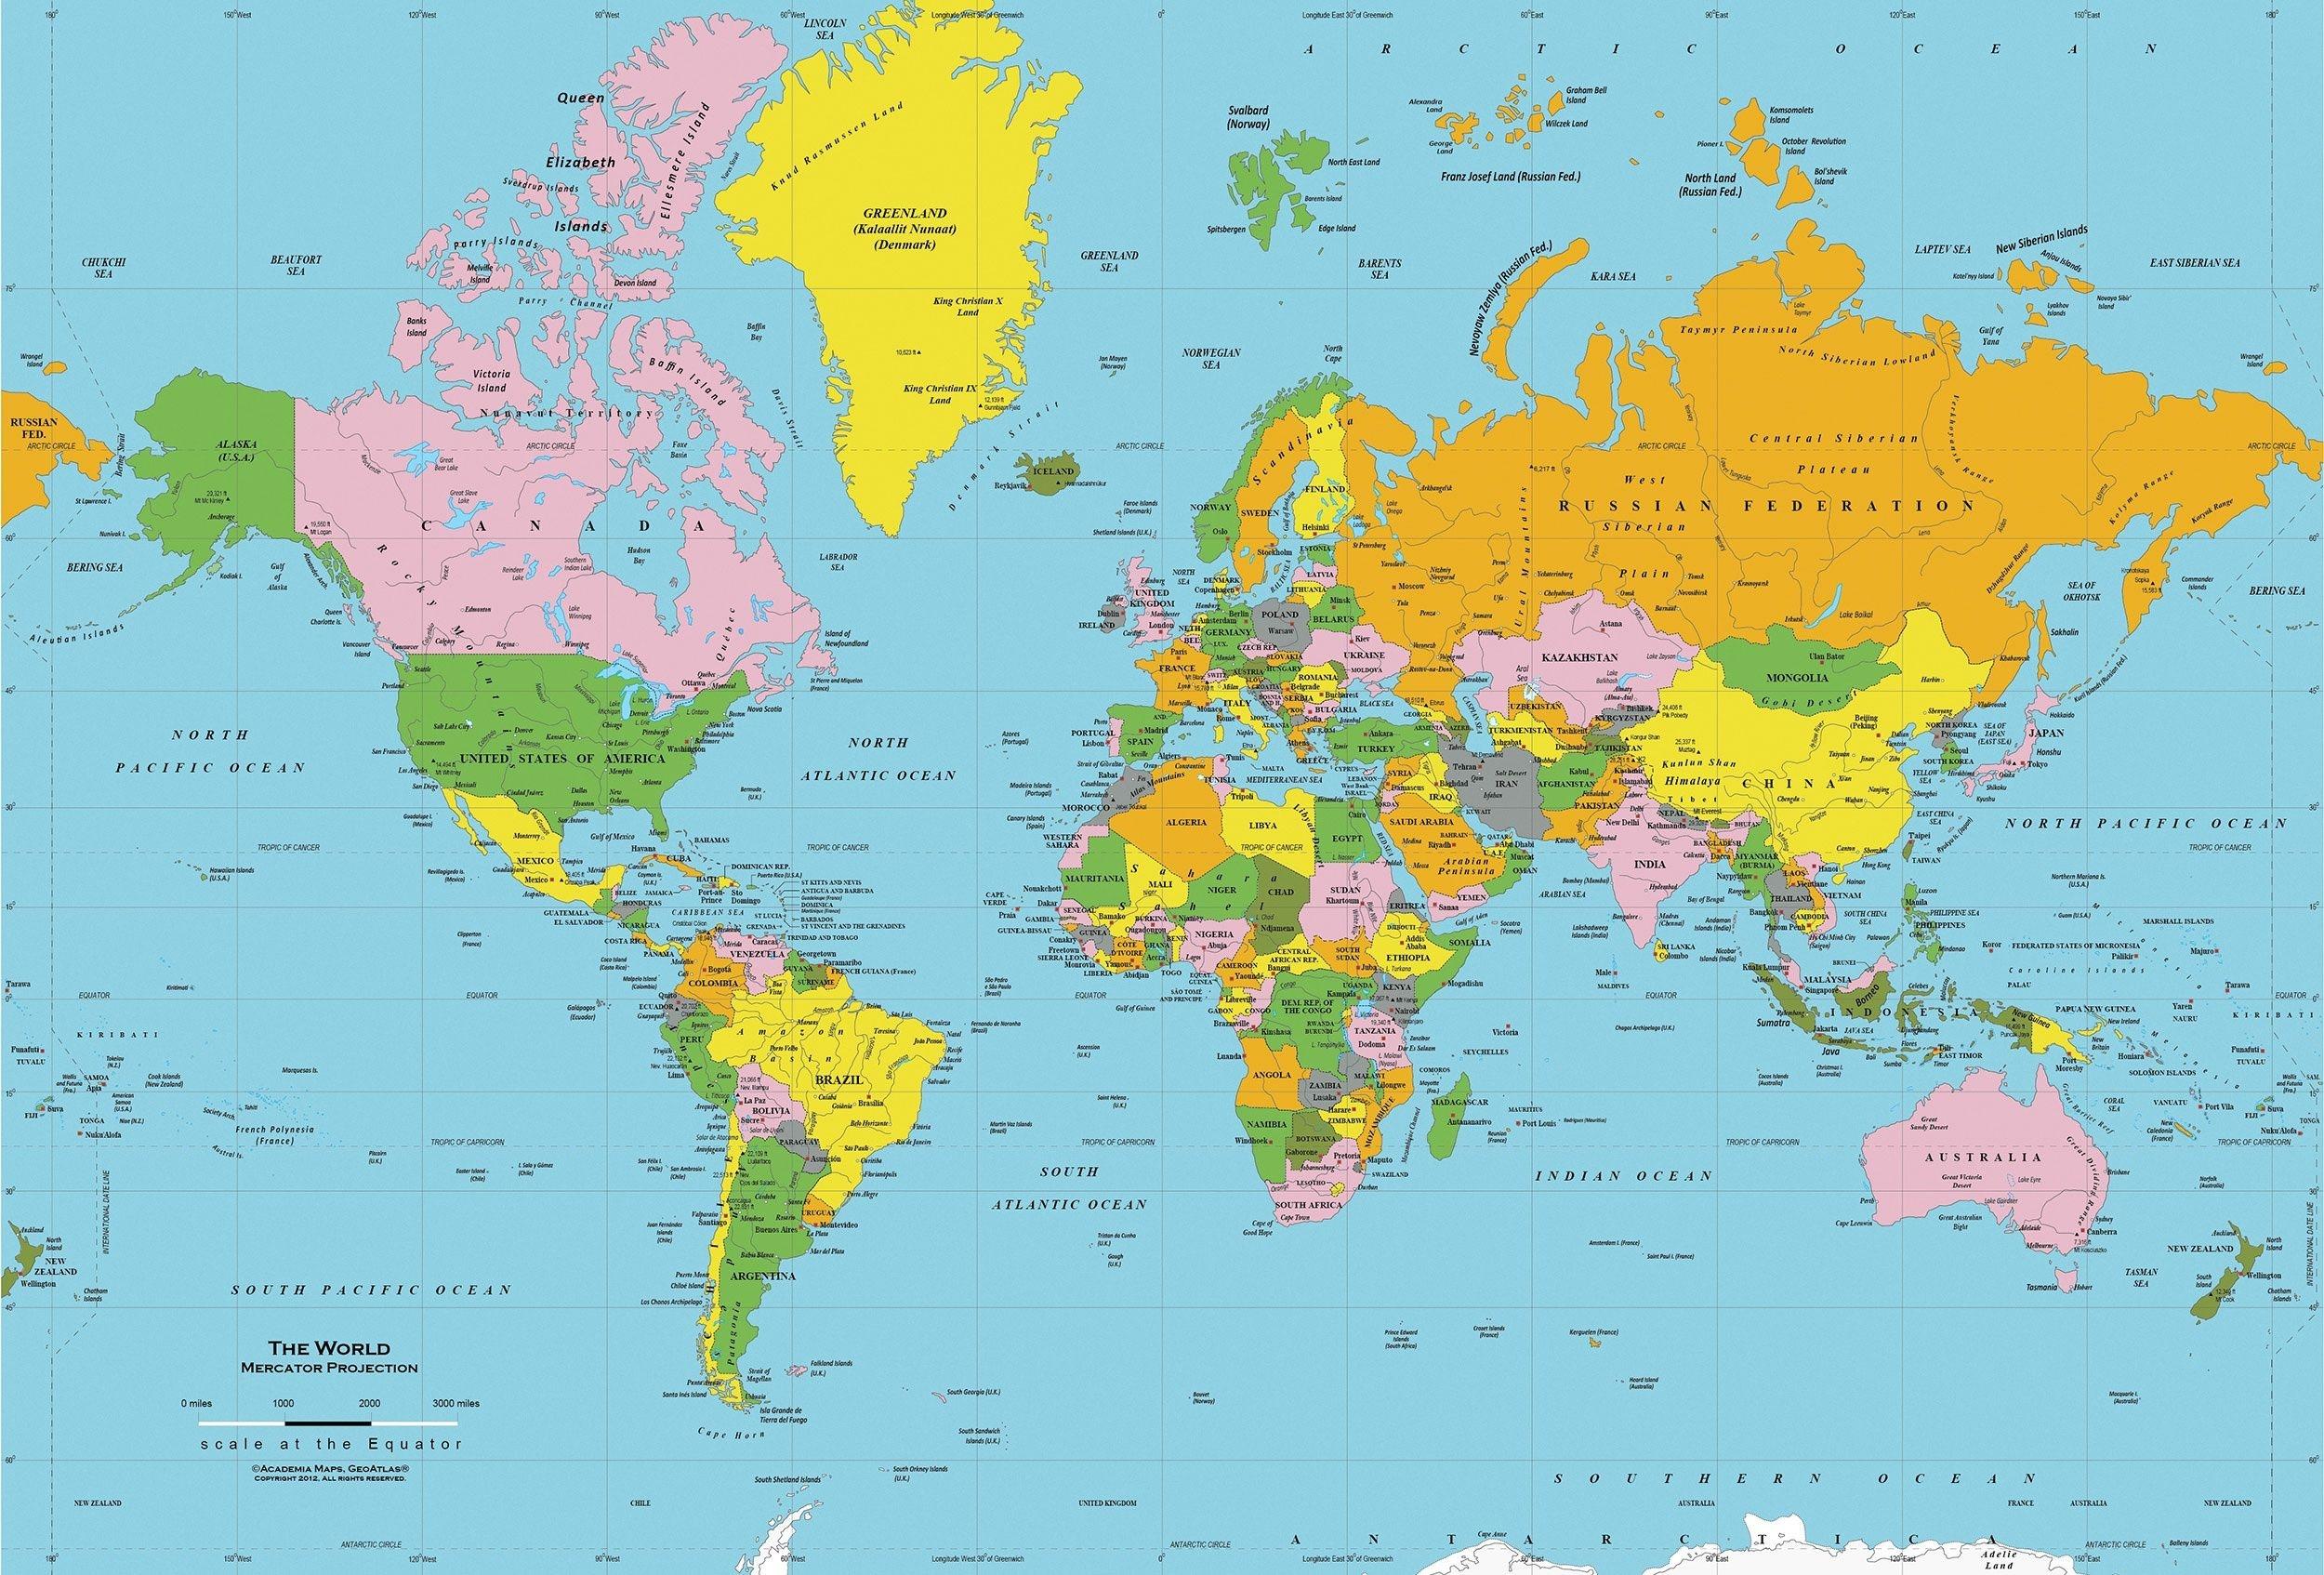 Printable World Map Free   Sitedesignco - Free Printable World Map Images